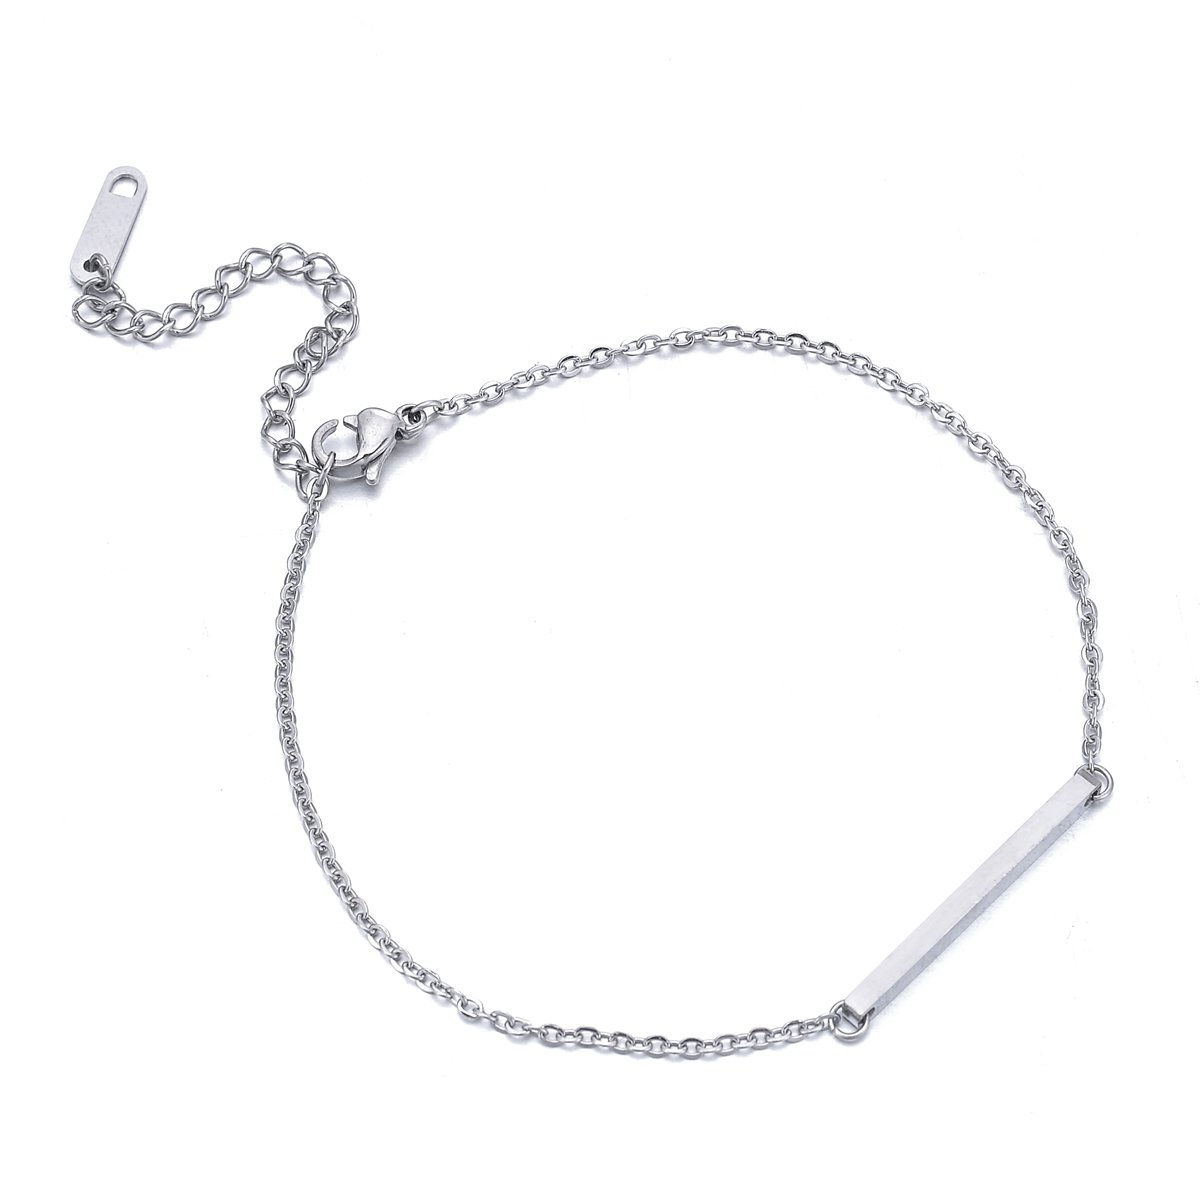 HooAMI Womens Stainlss Steel Anklet Bracelet Beach Barefoot Sandal Foot Chain 19cm+6cm Best-shopping BETY131254